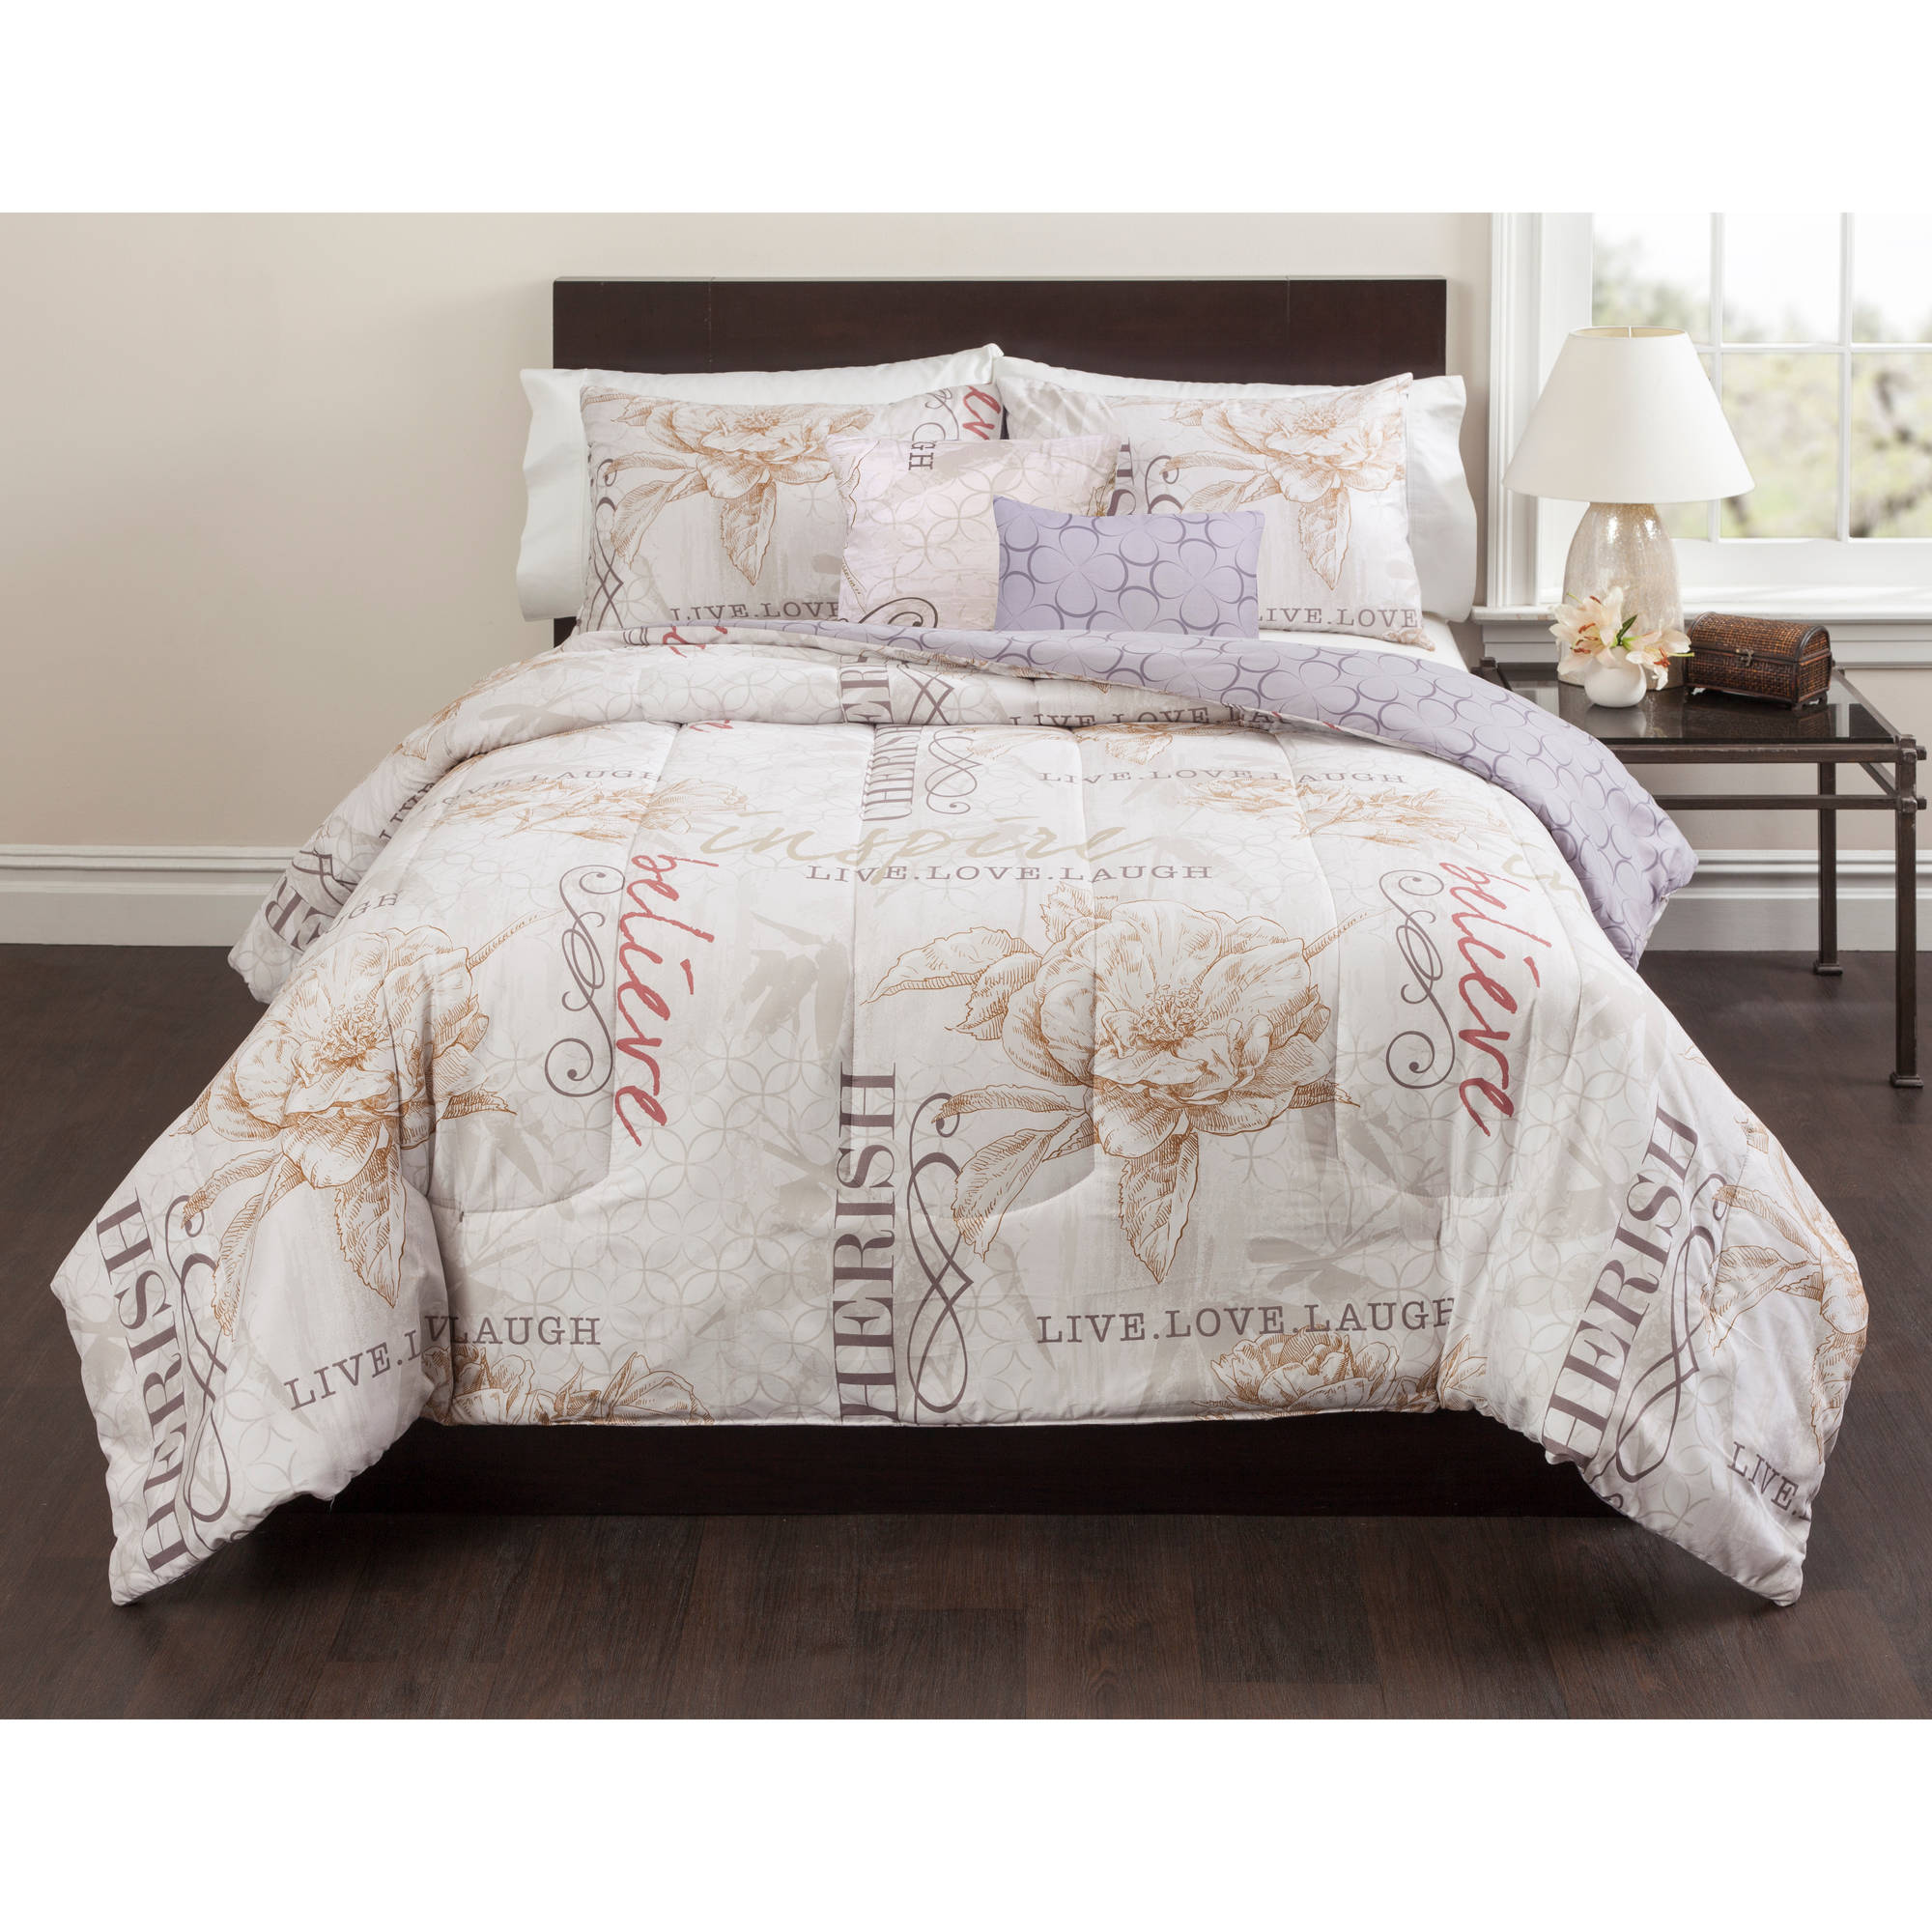 Casa Live, Laugh, Love 5-Piece Bedding Comforter Set